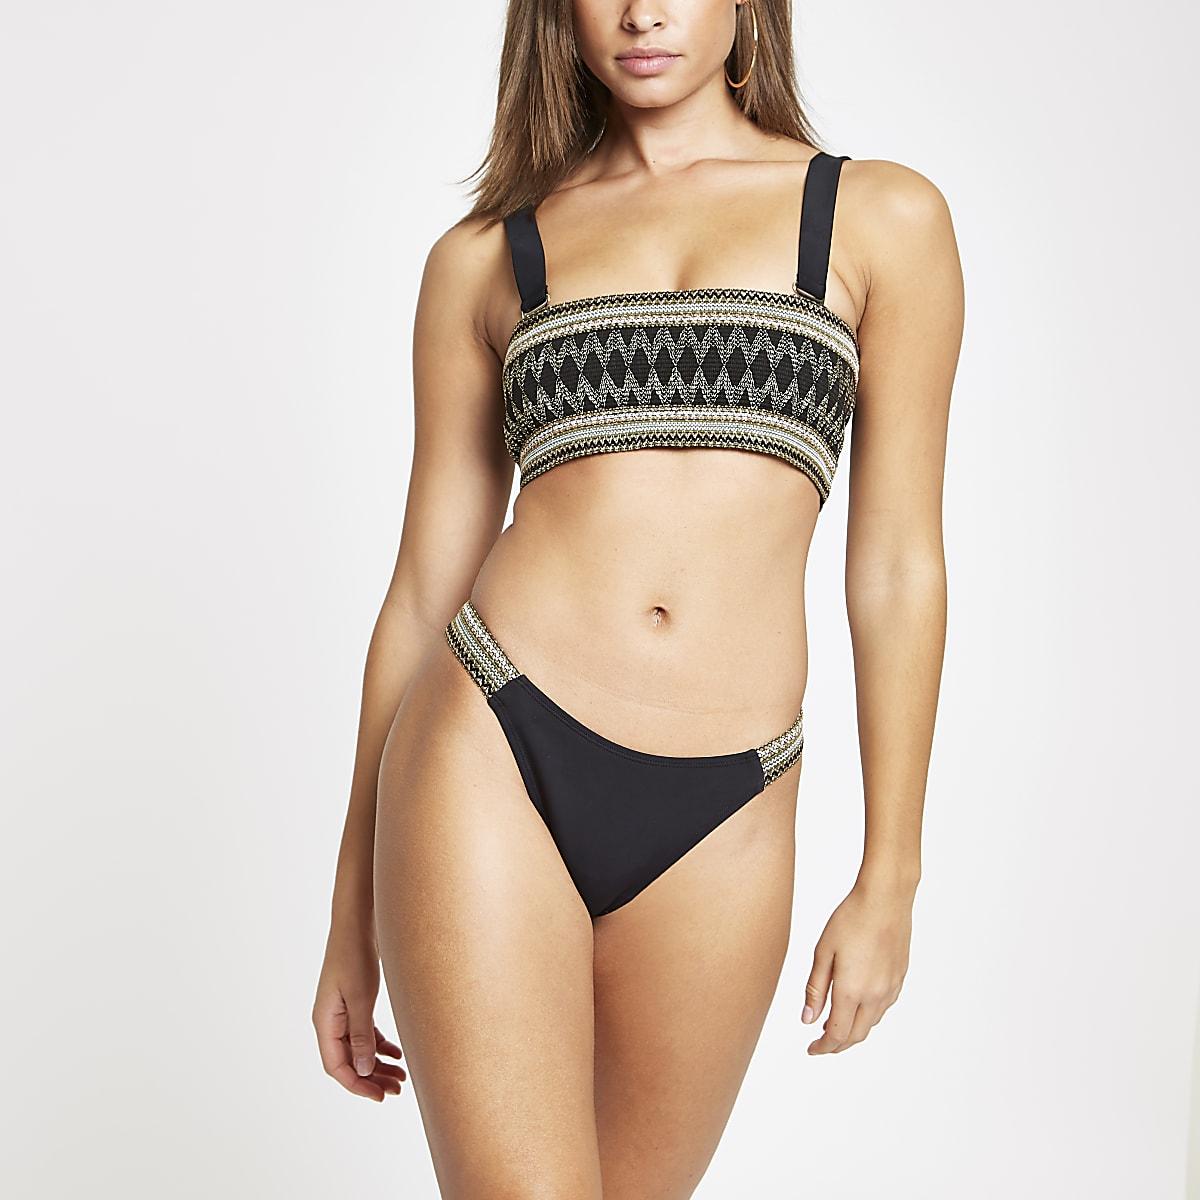 Black metallic high leg bikini bottoms